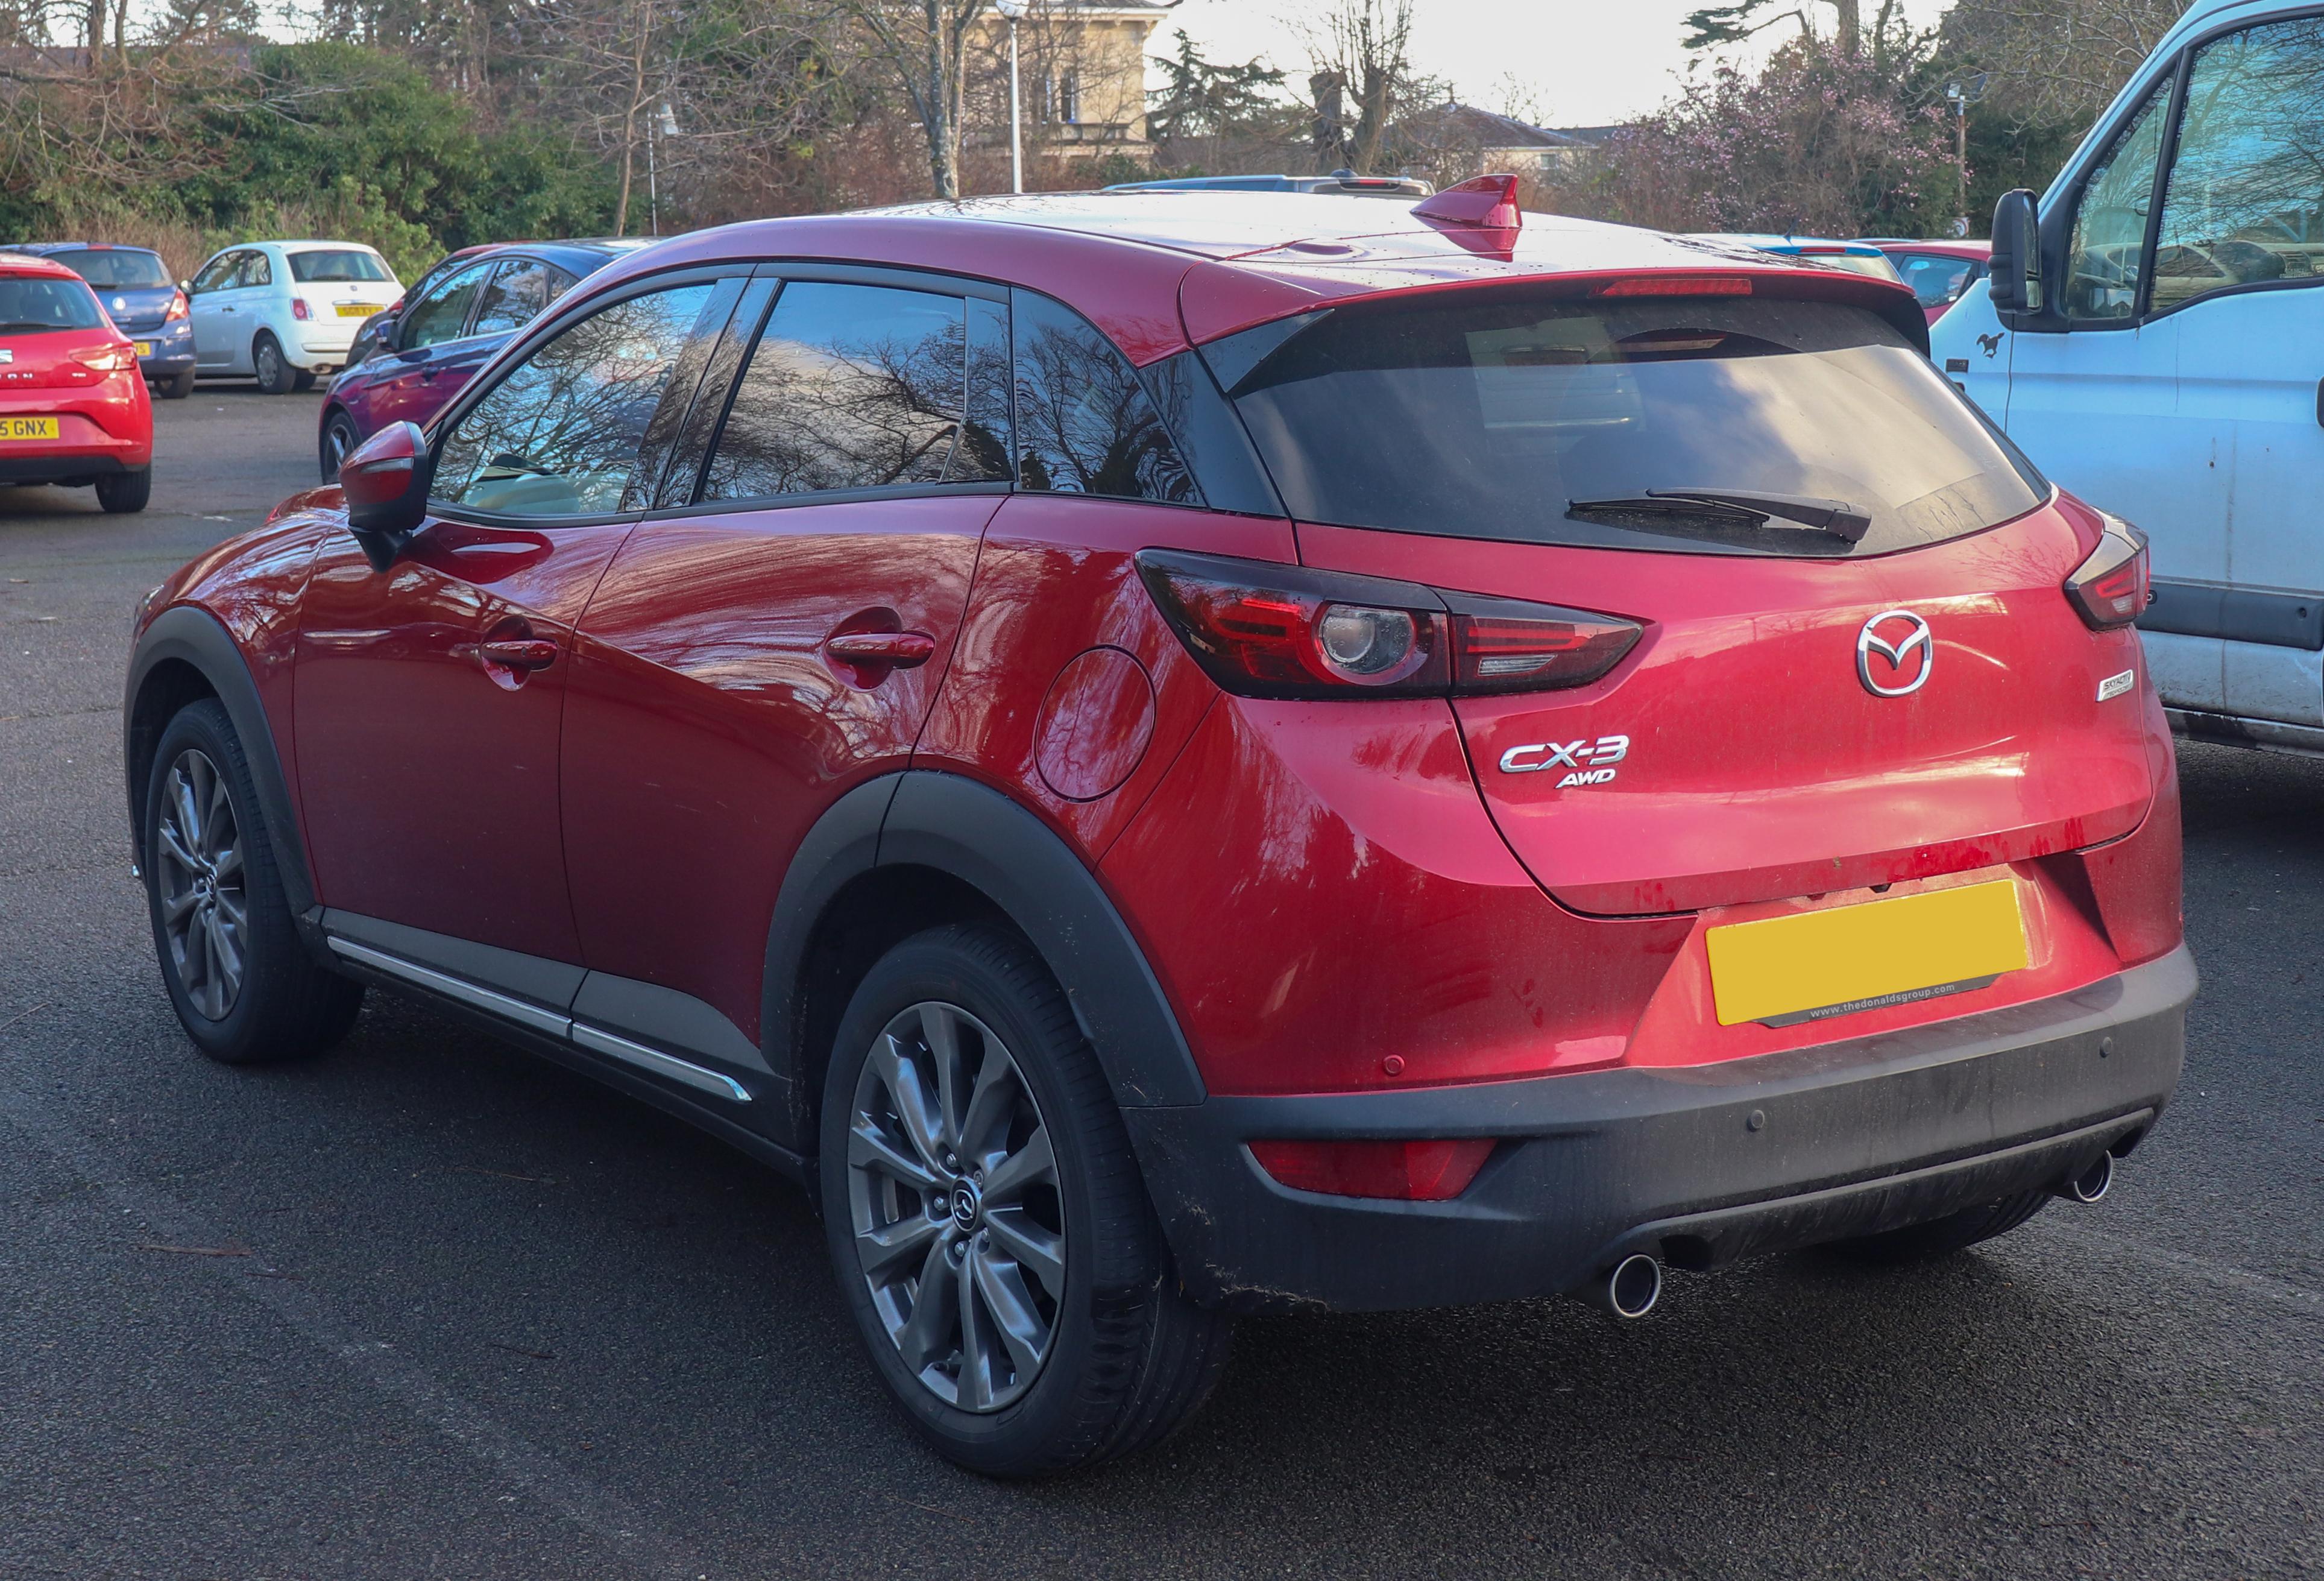 Kekurangan Mazda Cx 3 4X4 Spesifikasi